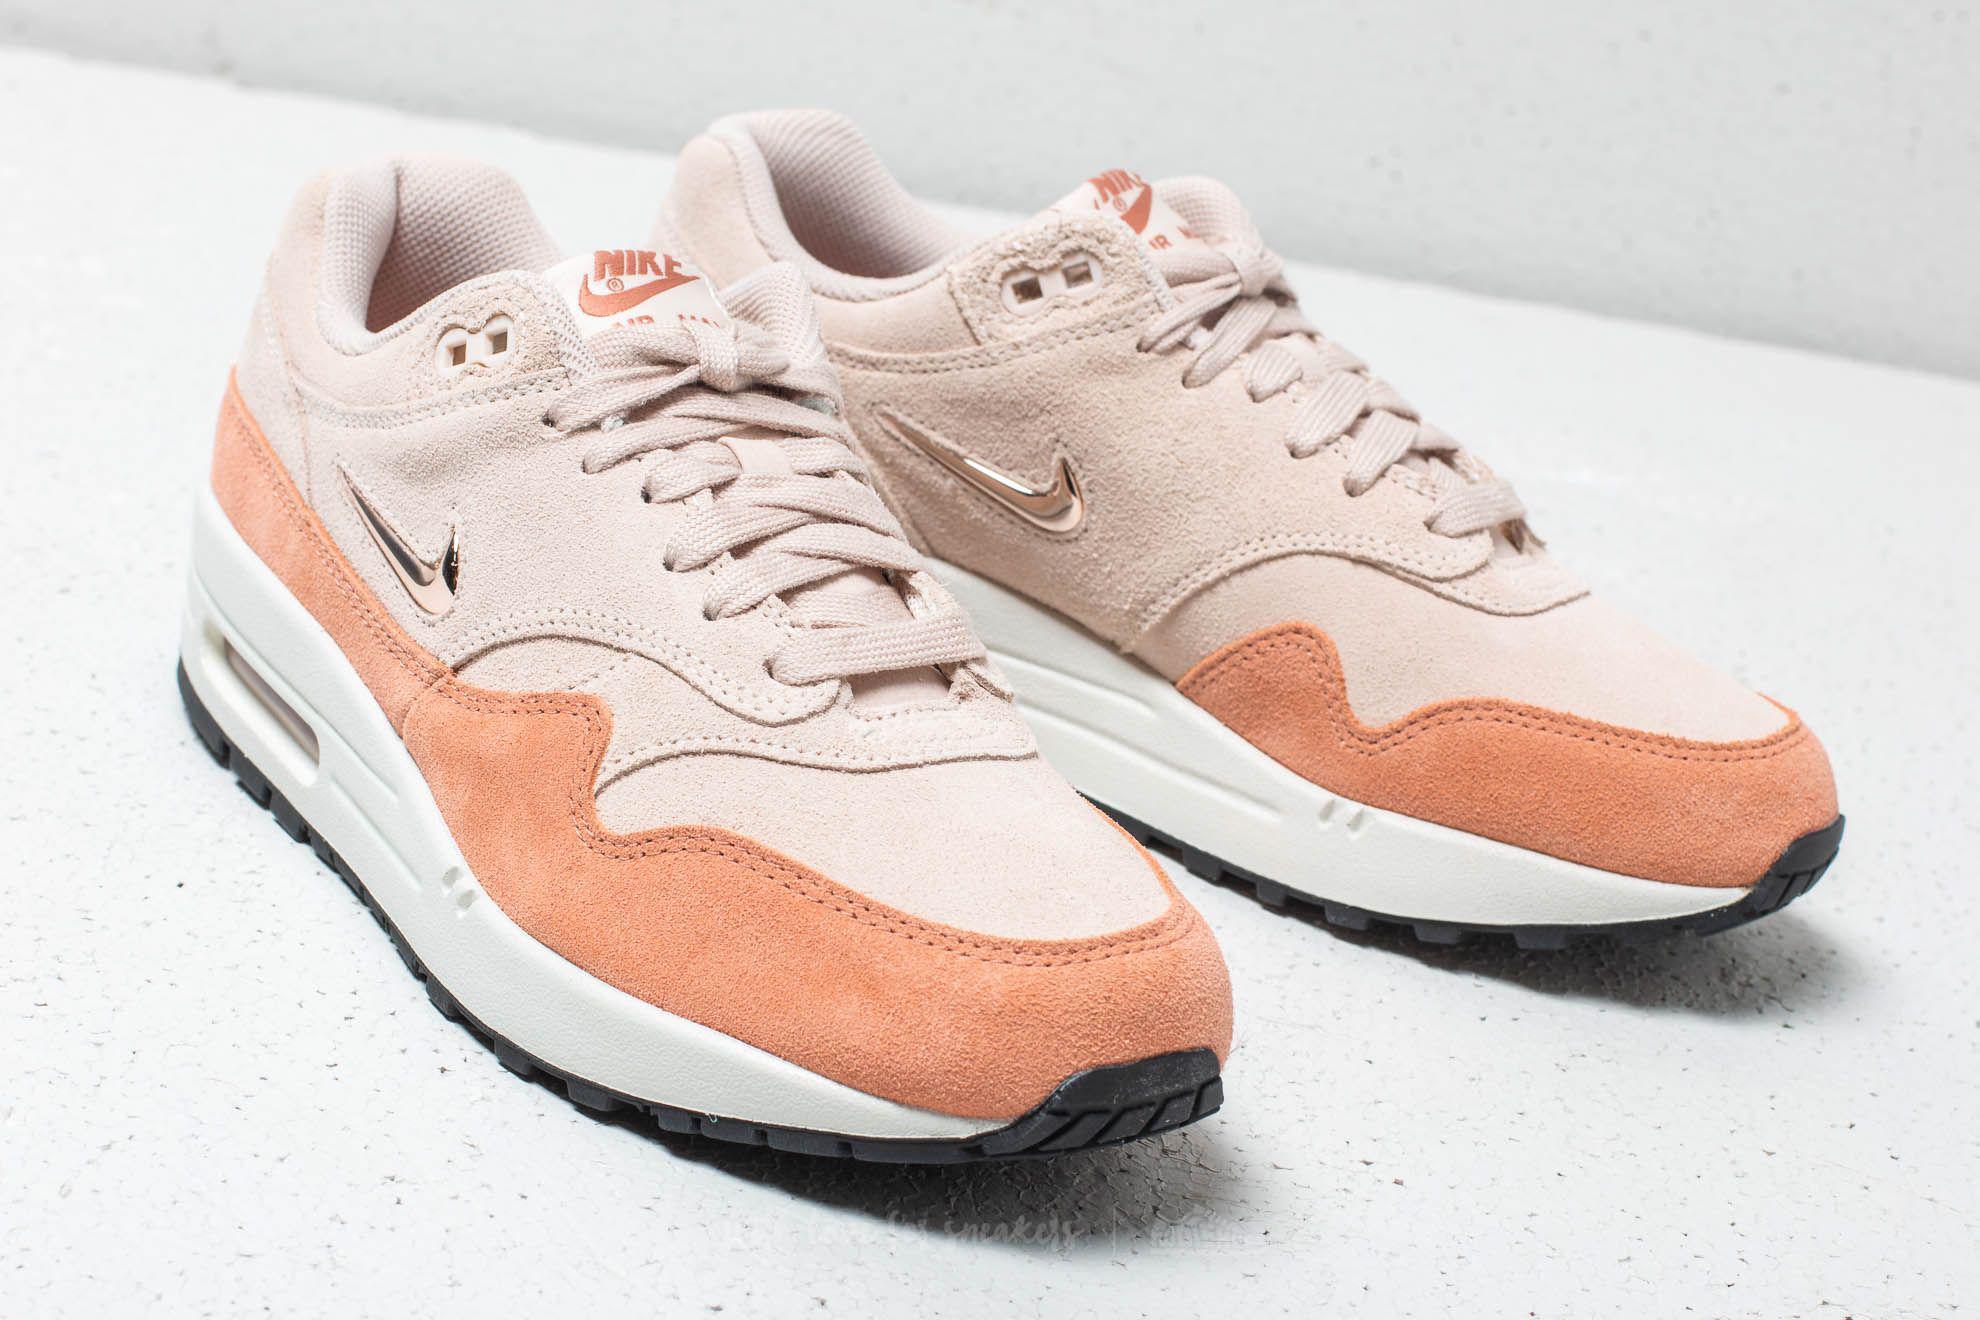 competitive price 5aa2f 98a3f Lyst - Nike W Air Max 1 Premium Sc Guava Ice  Metallic Bronze